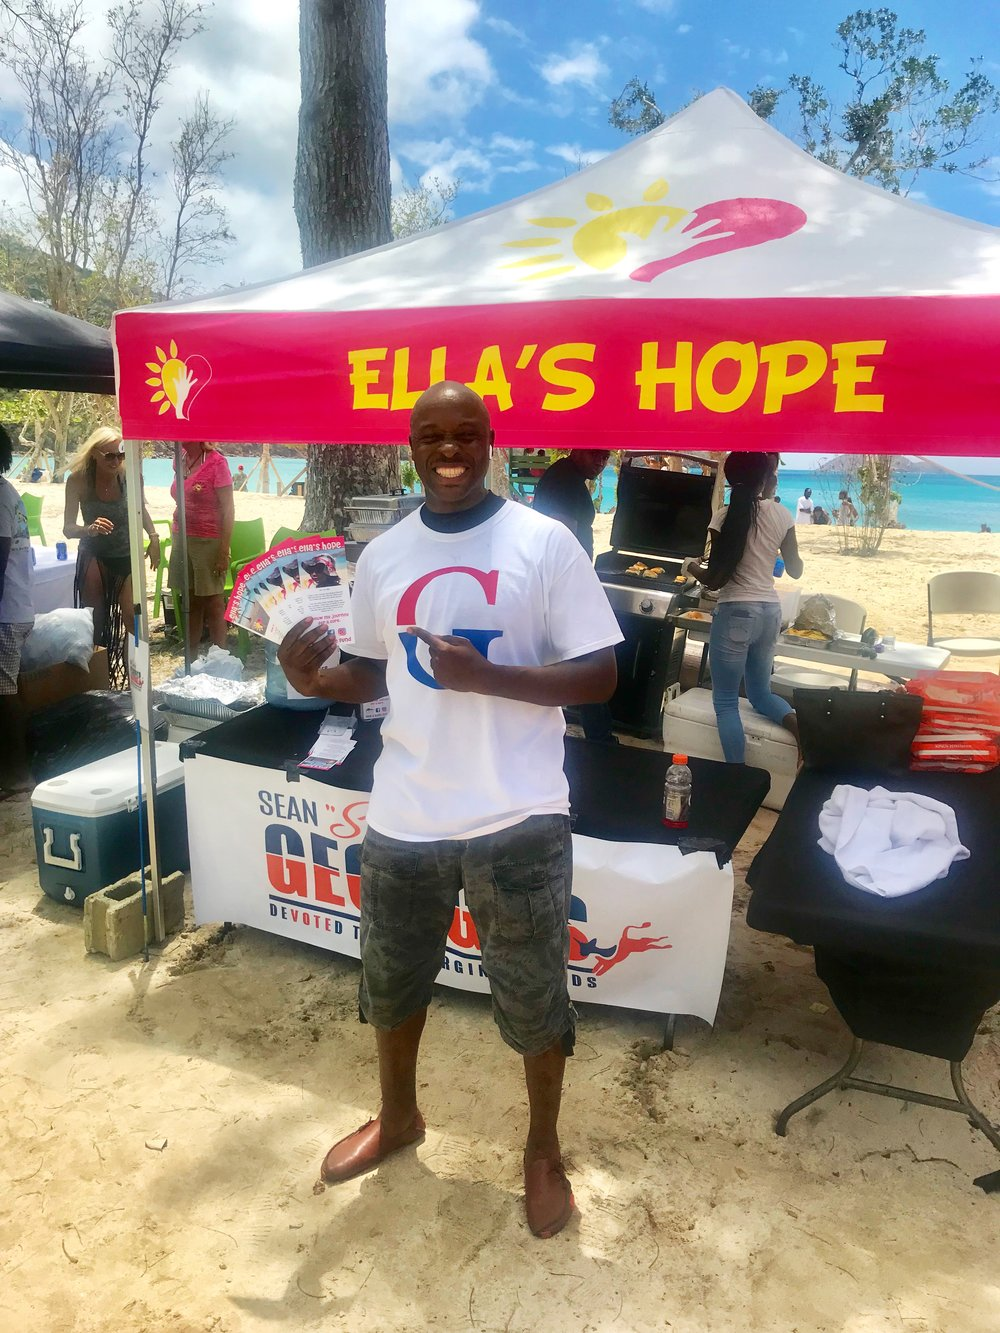 Sean Georges at Ella's Hope, King of the Wing, Magens Bay, St. Thomas, USVI.